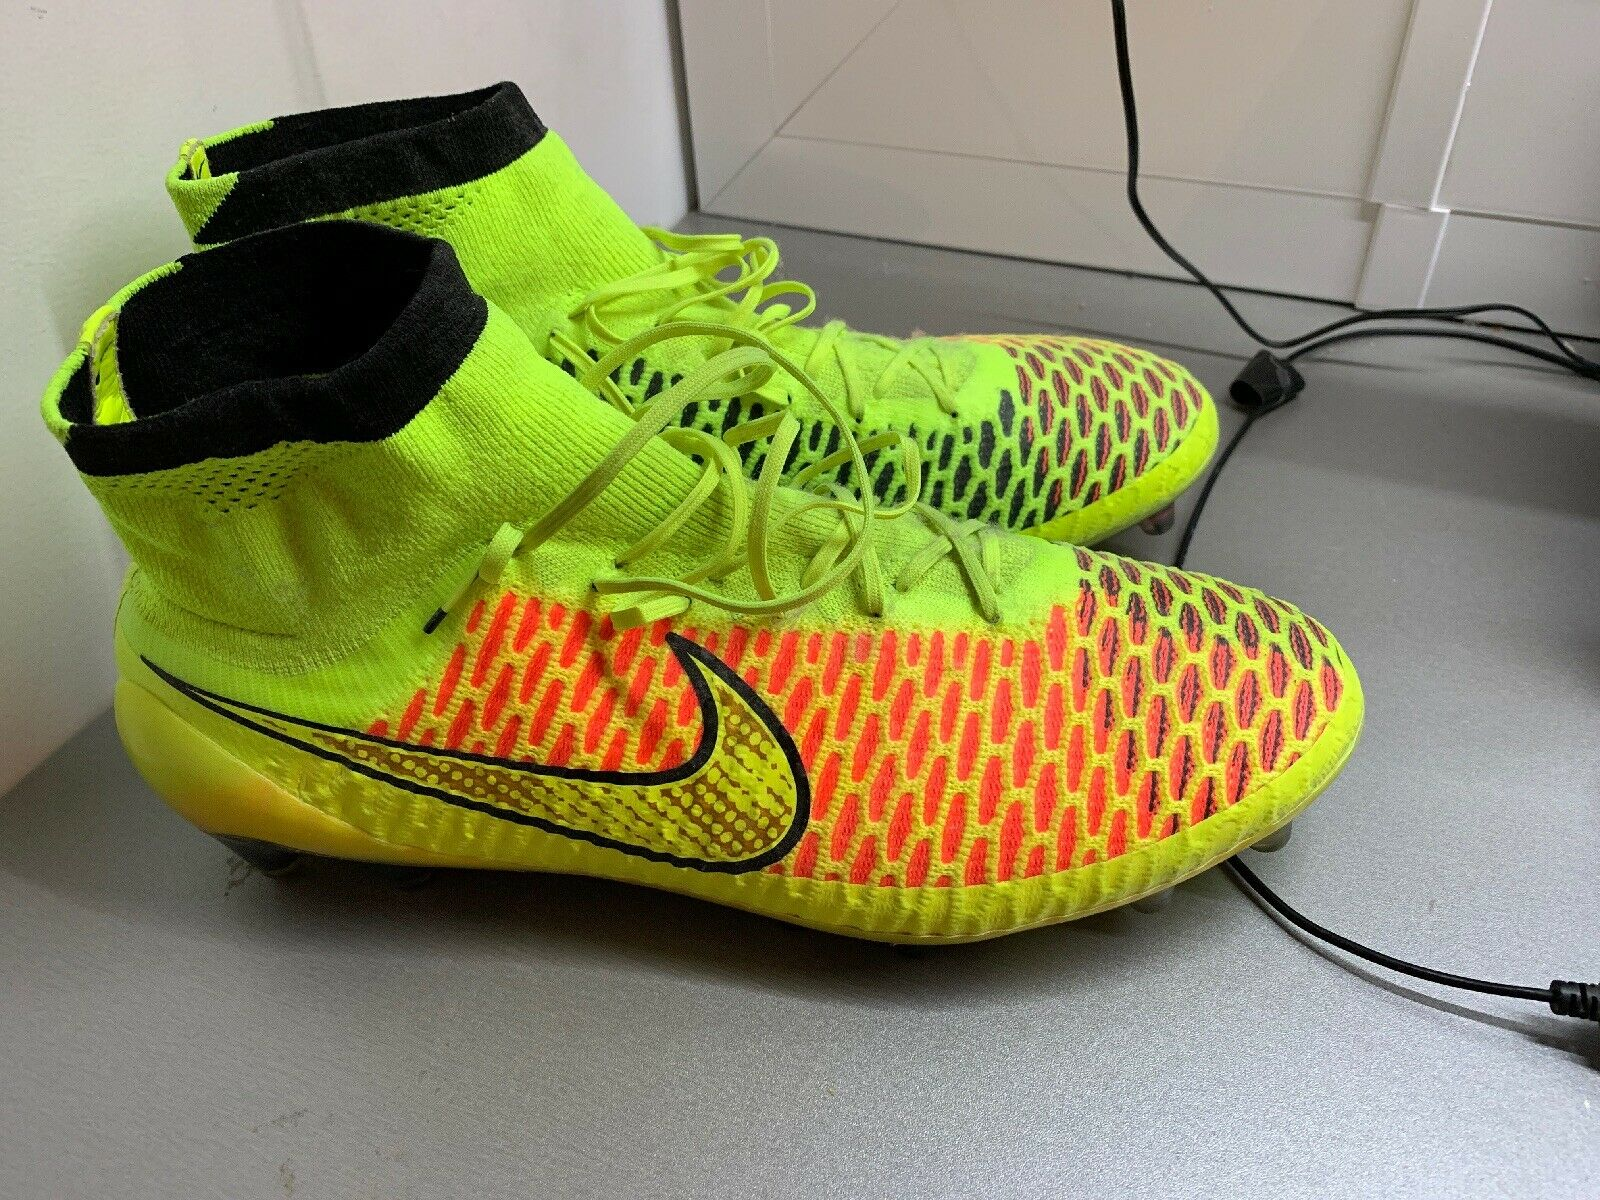 Nike magista obra World Cup 2014